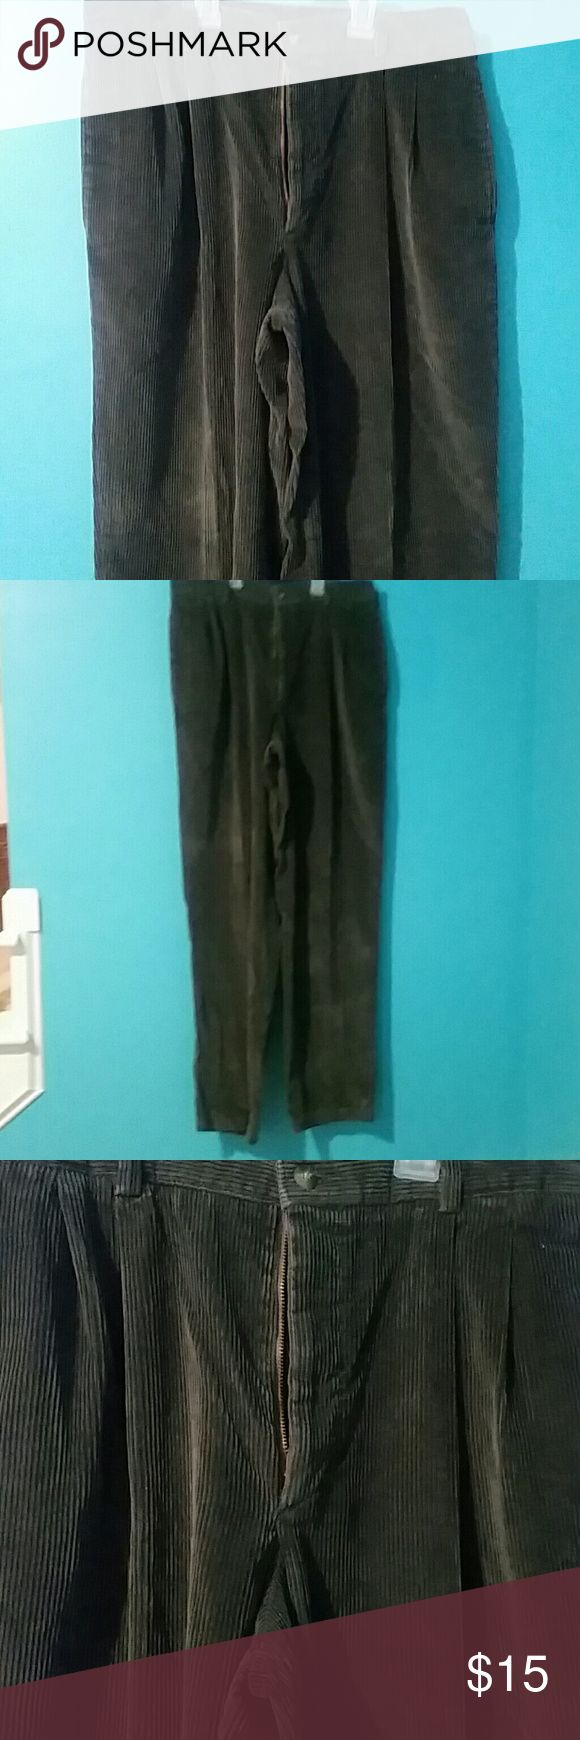 Corduroy Slacks Never worn, perfect for coming winter weather Savane Pants Corduroy